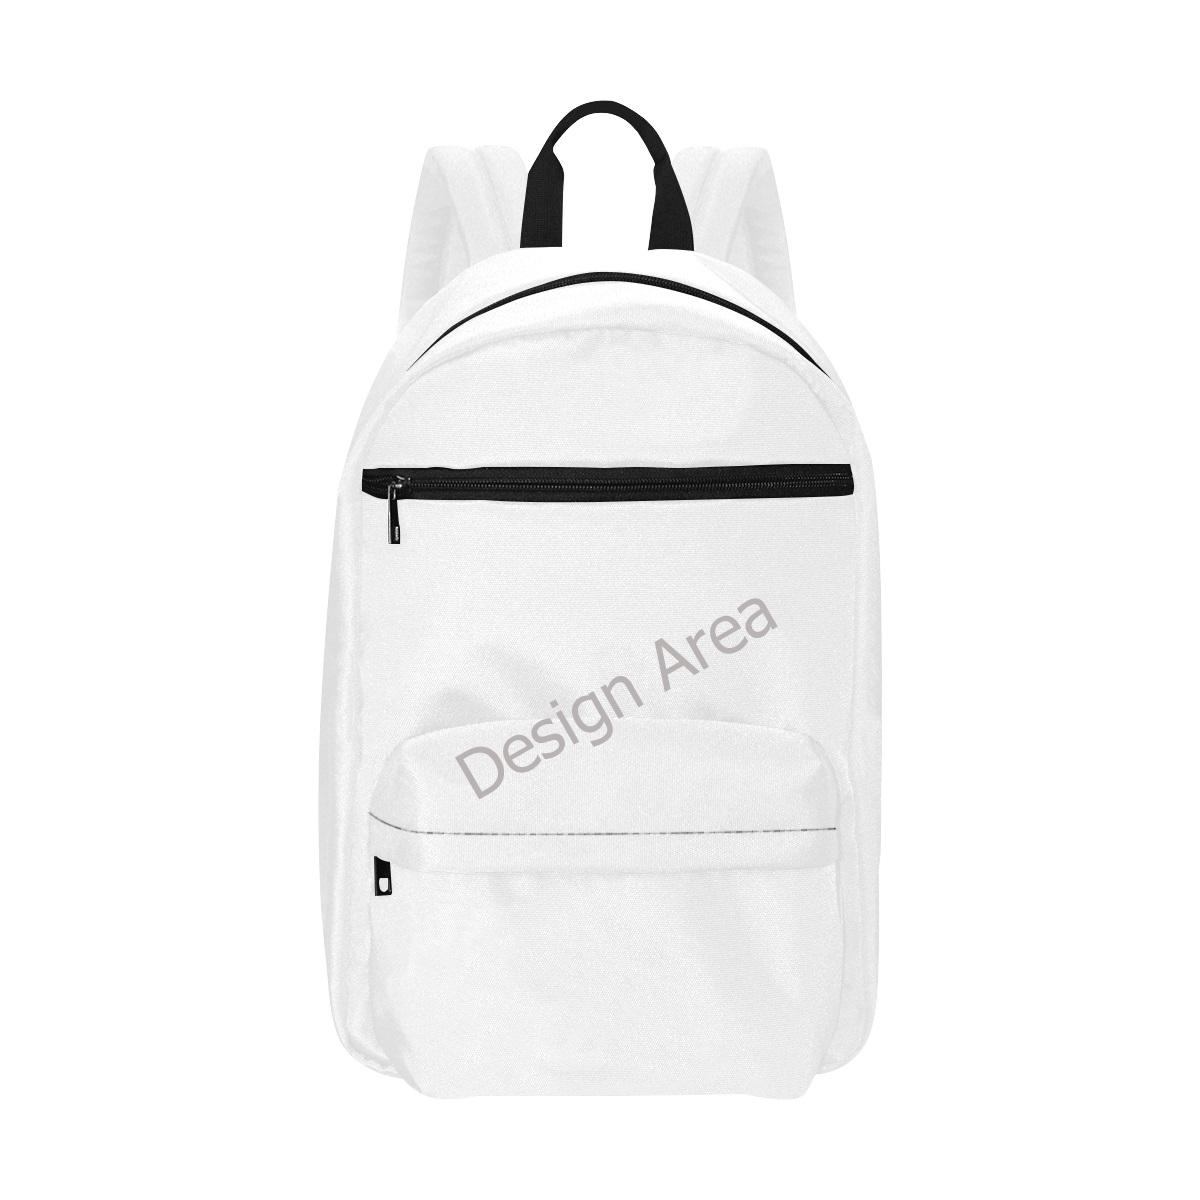 Large Capacity Travel Backpack (Model 1691)